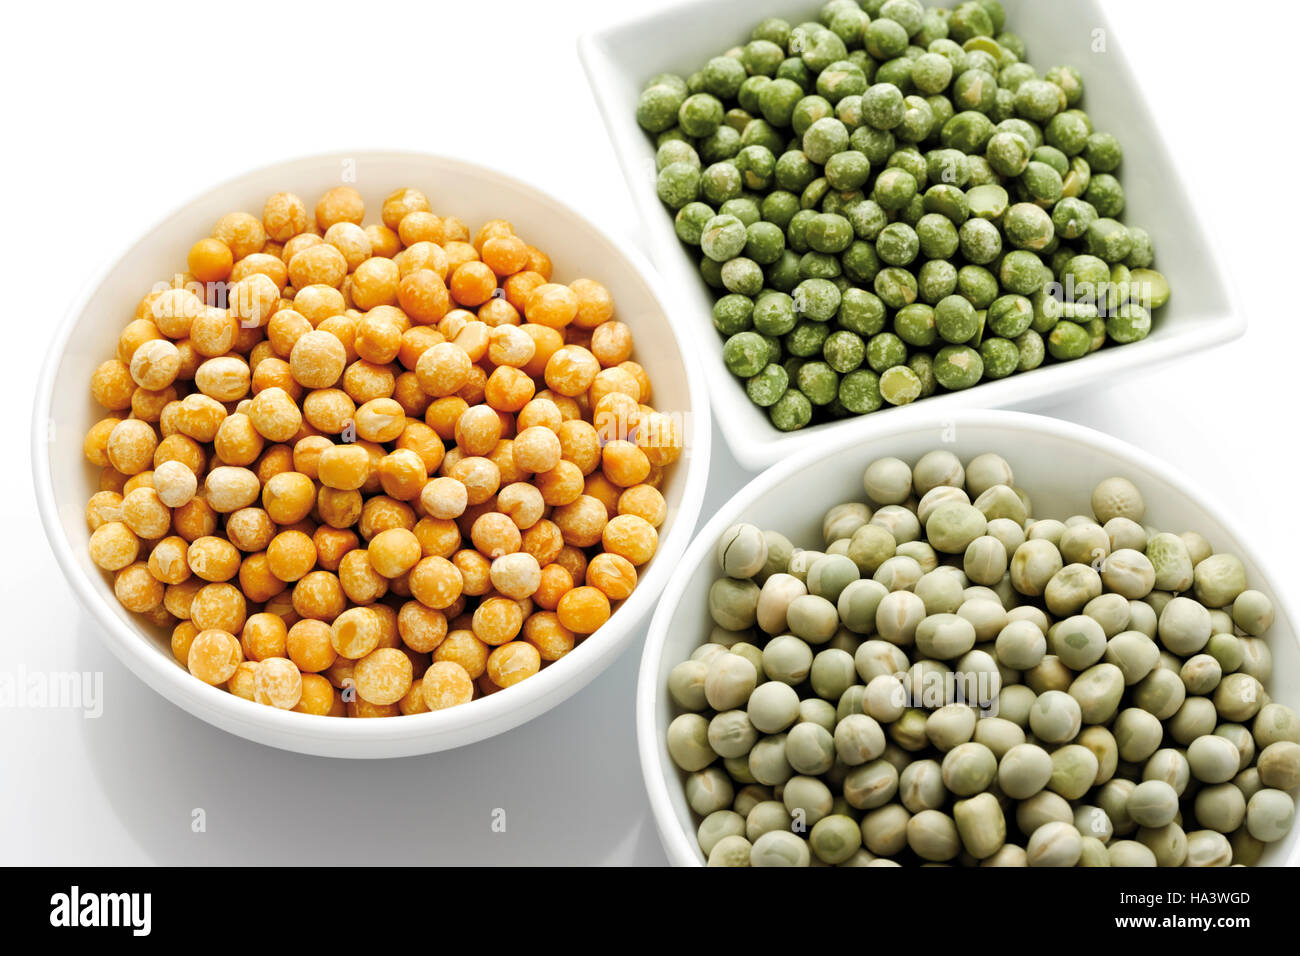 Types Of Peas Stock Photos Types Of Peas Stock Images Alamy